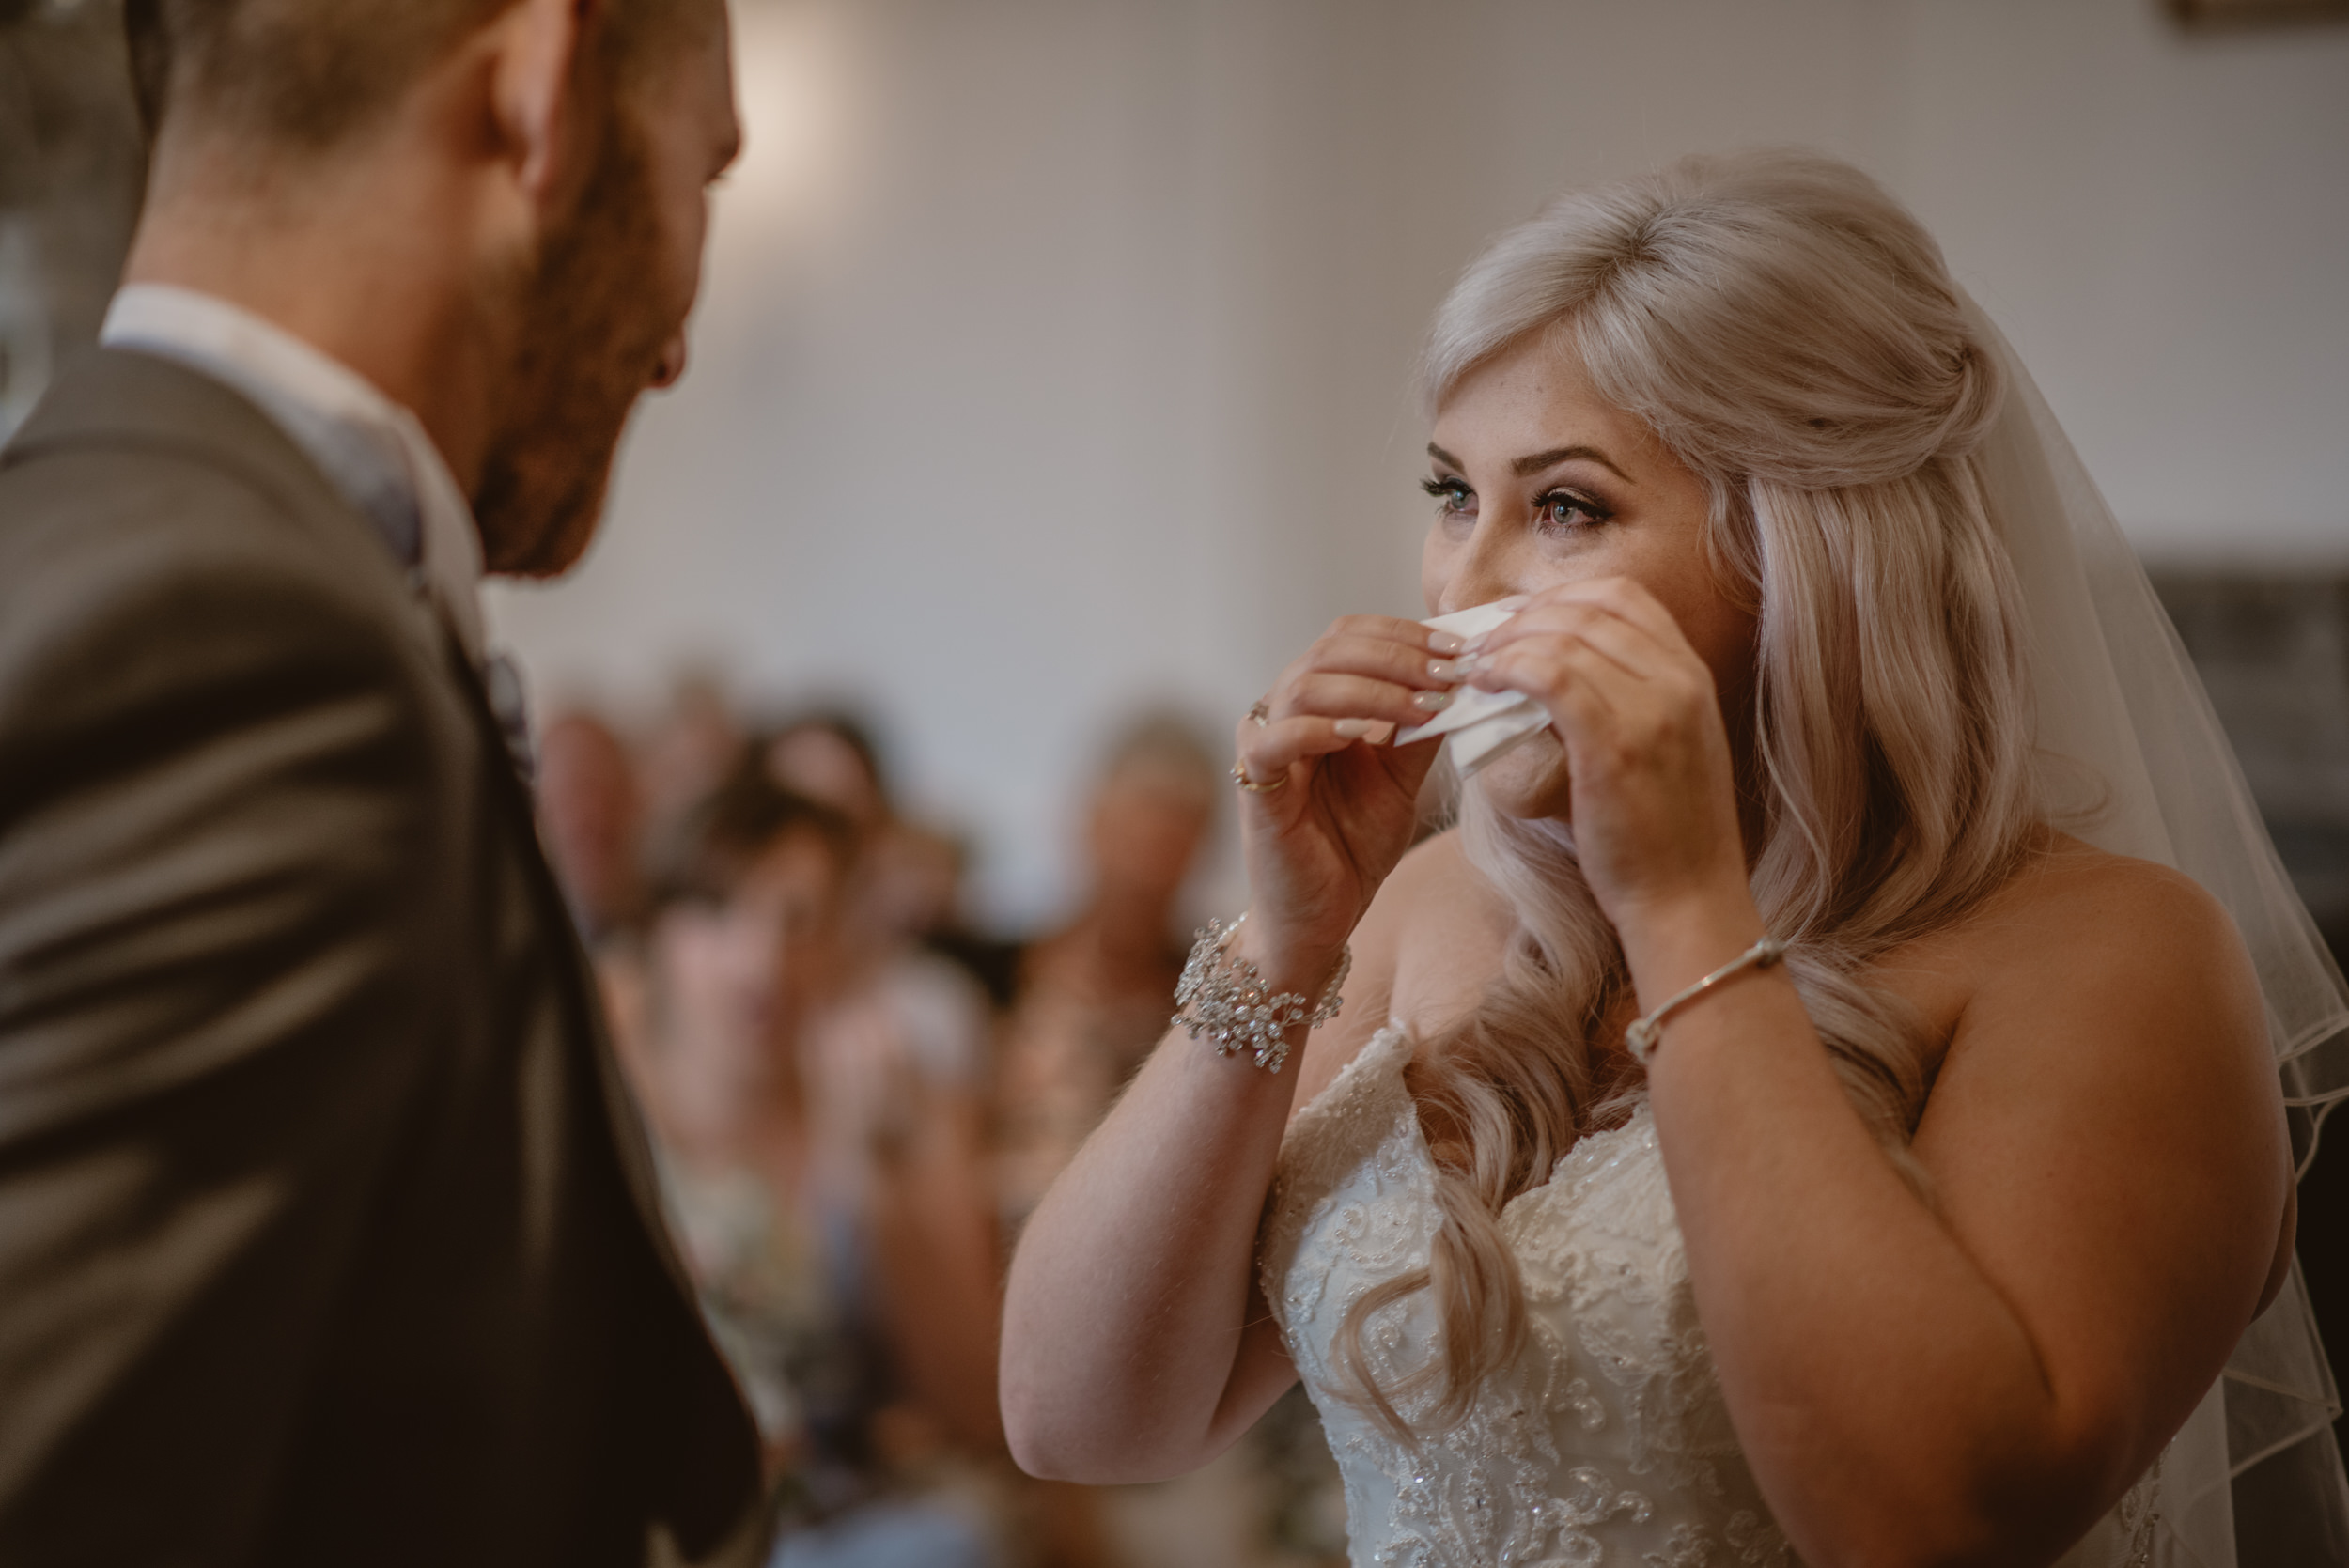 Rachel-and-James-Wedding-Horsley-Towers-State-Manu-Mendoza-Wedding-Photography-258.jpg